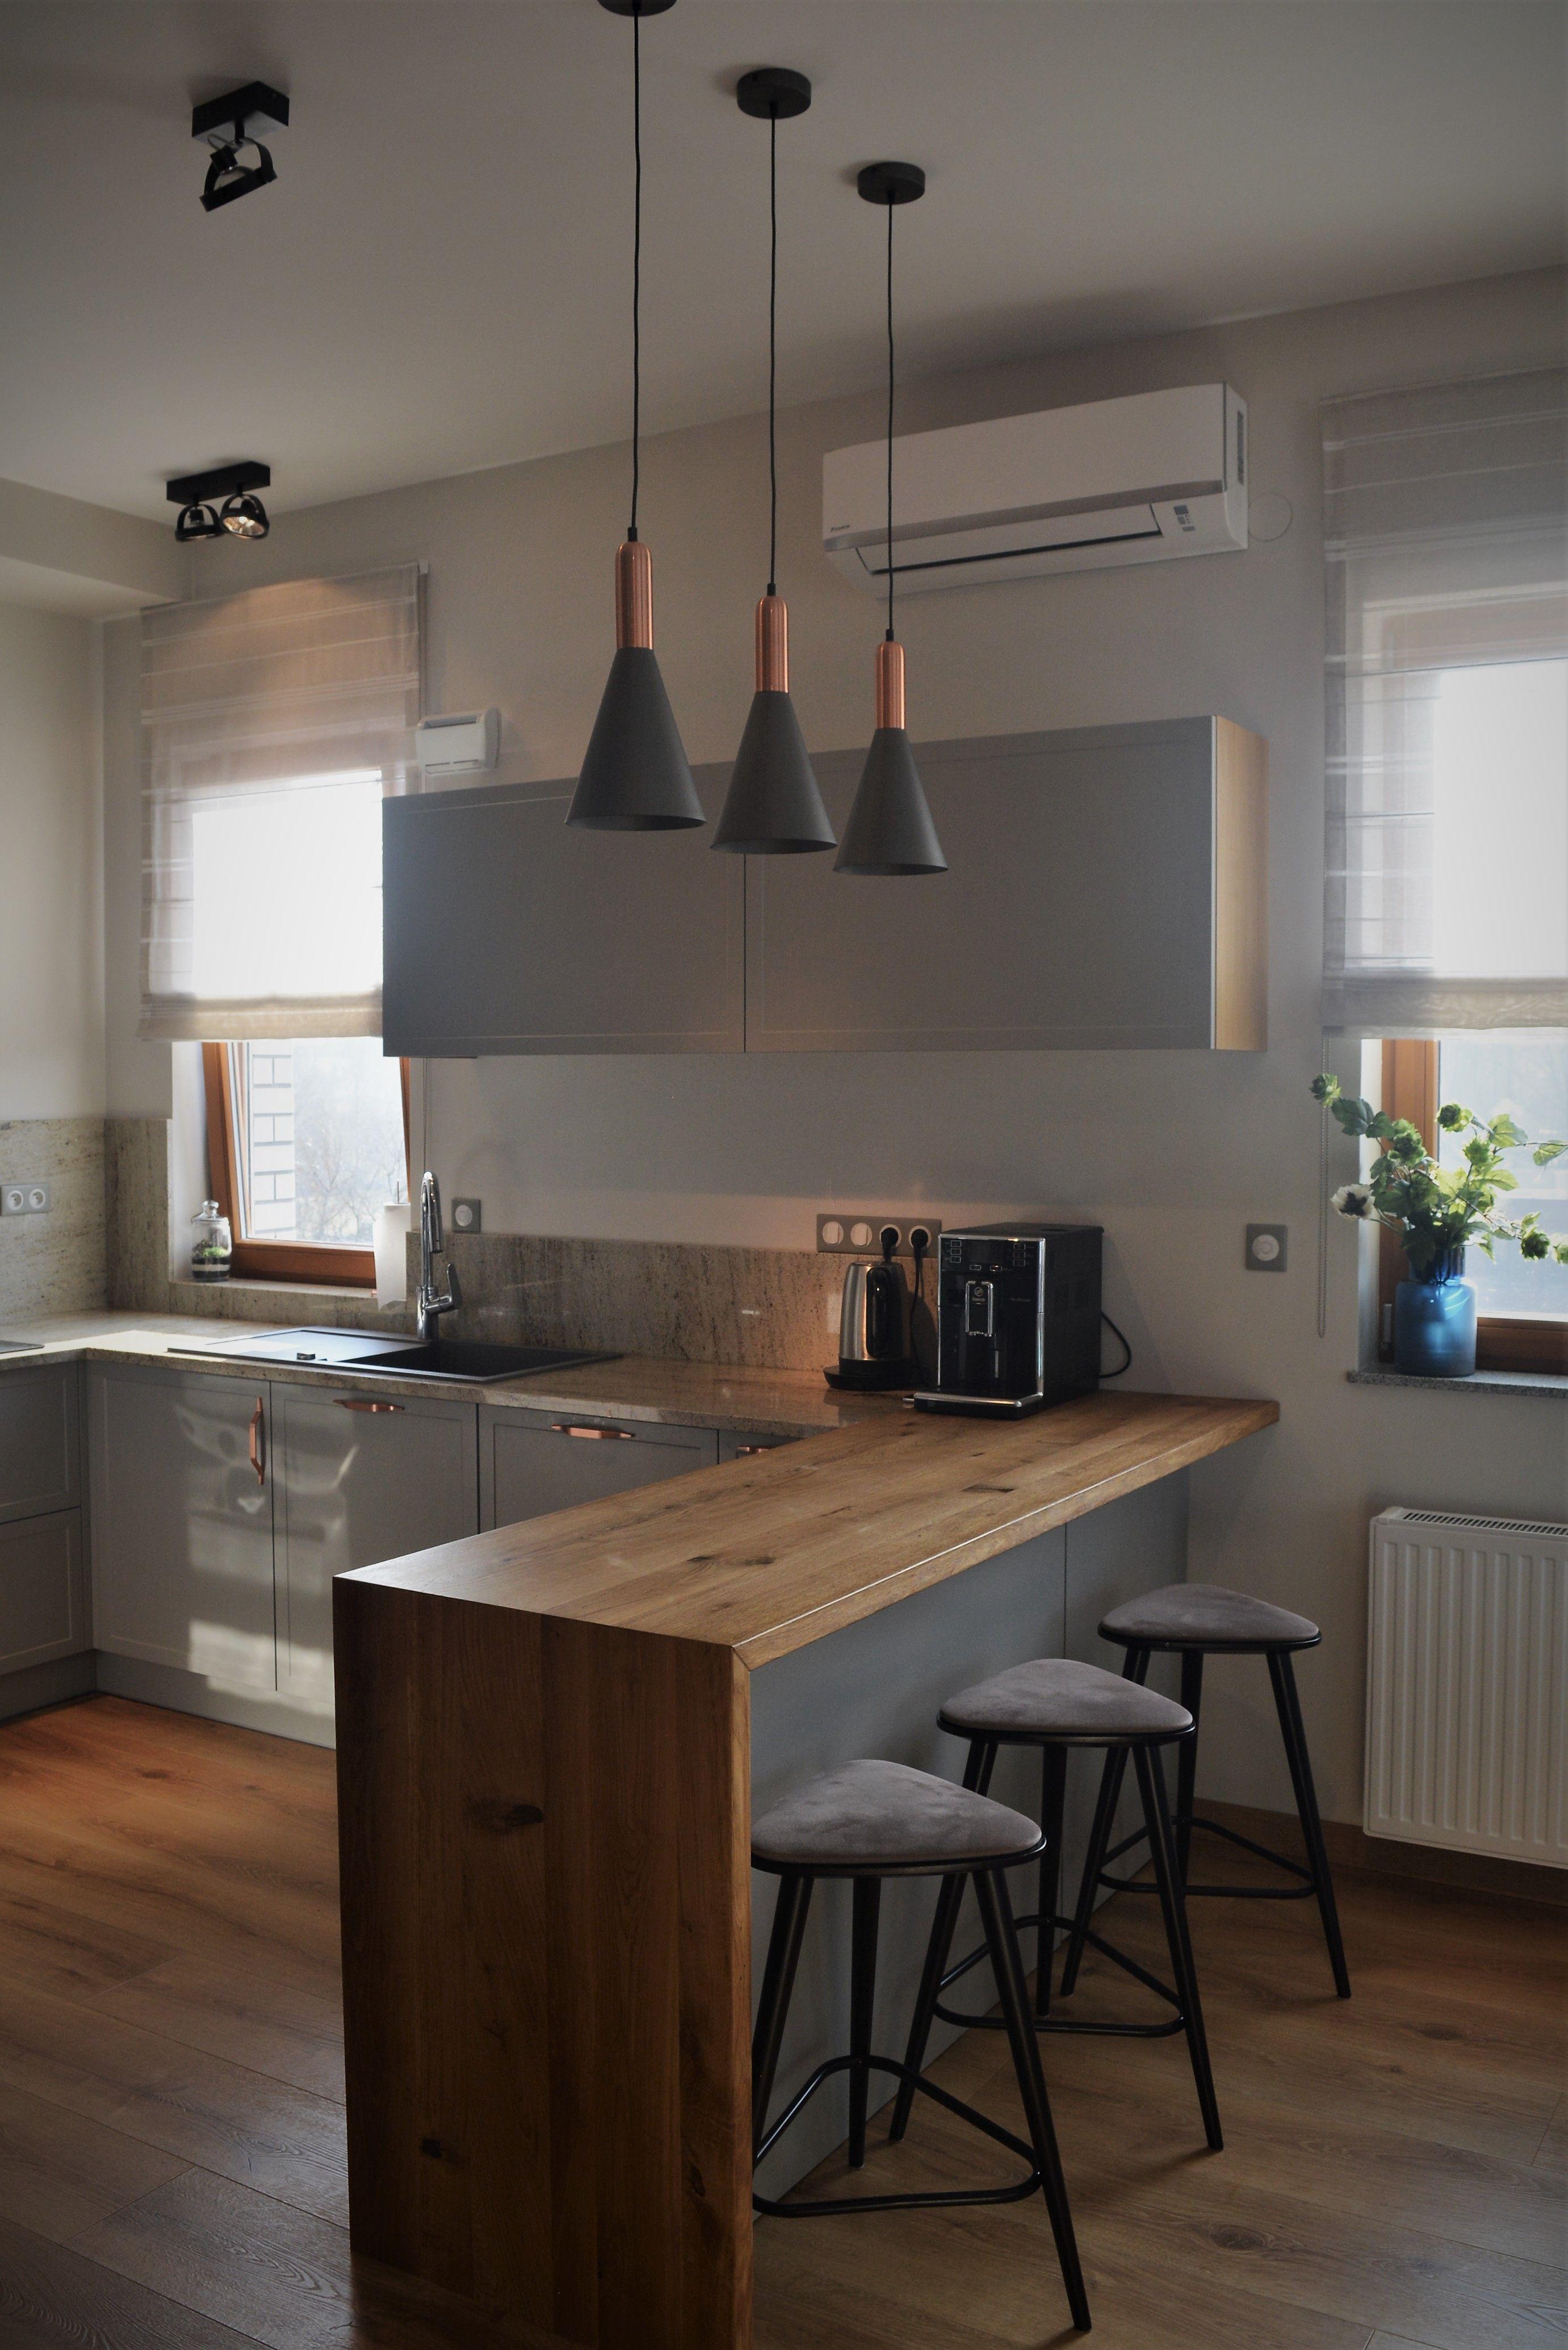 Kitchen Design By Paulina Szczygielska Kitchen Design Home Decor Kitchen